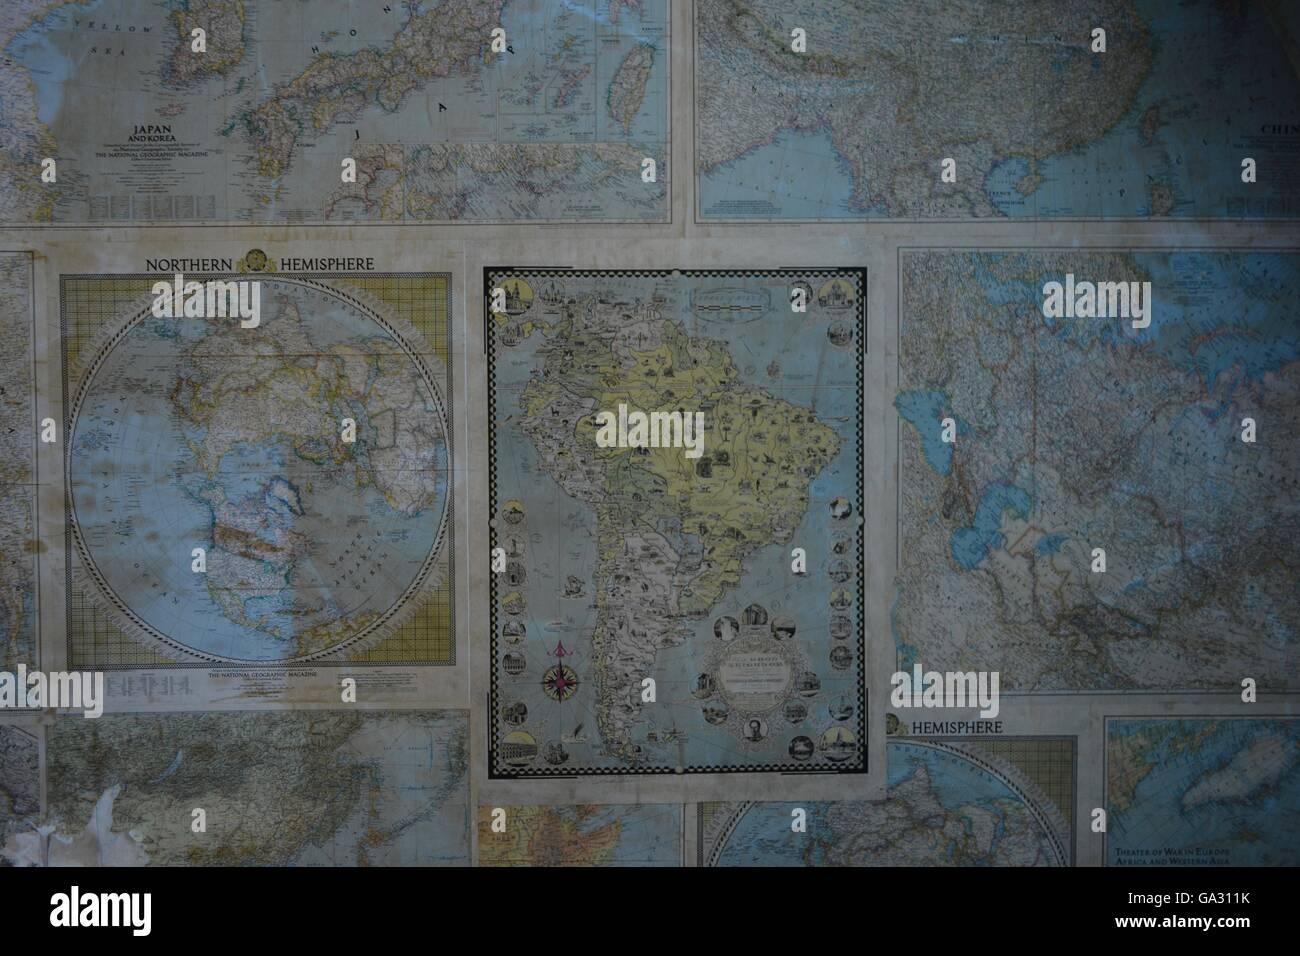 Maps Cartography Stockfotos & Maps Cartography Bilder - Seite 3 - Alamy